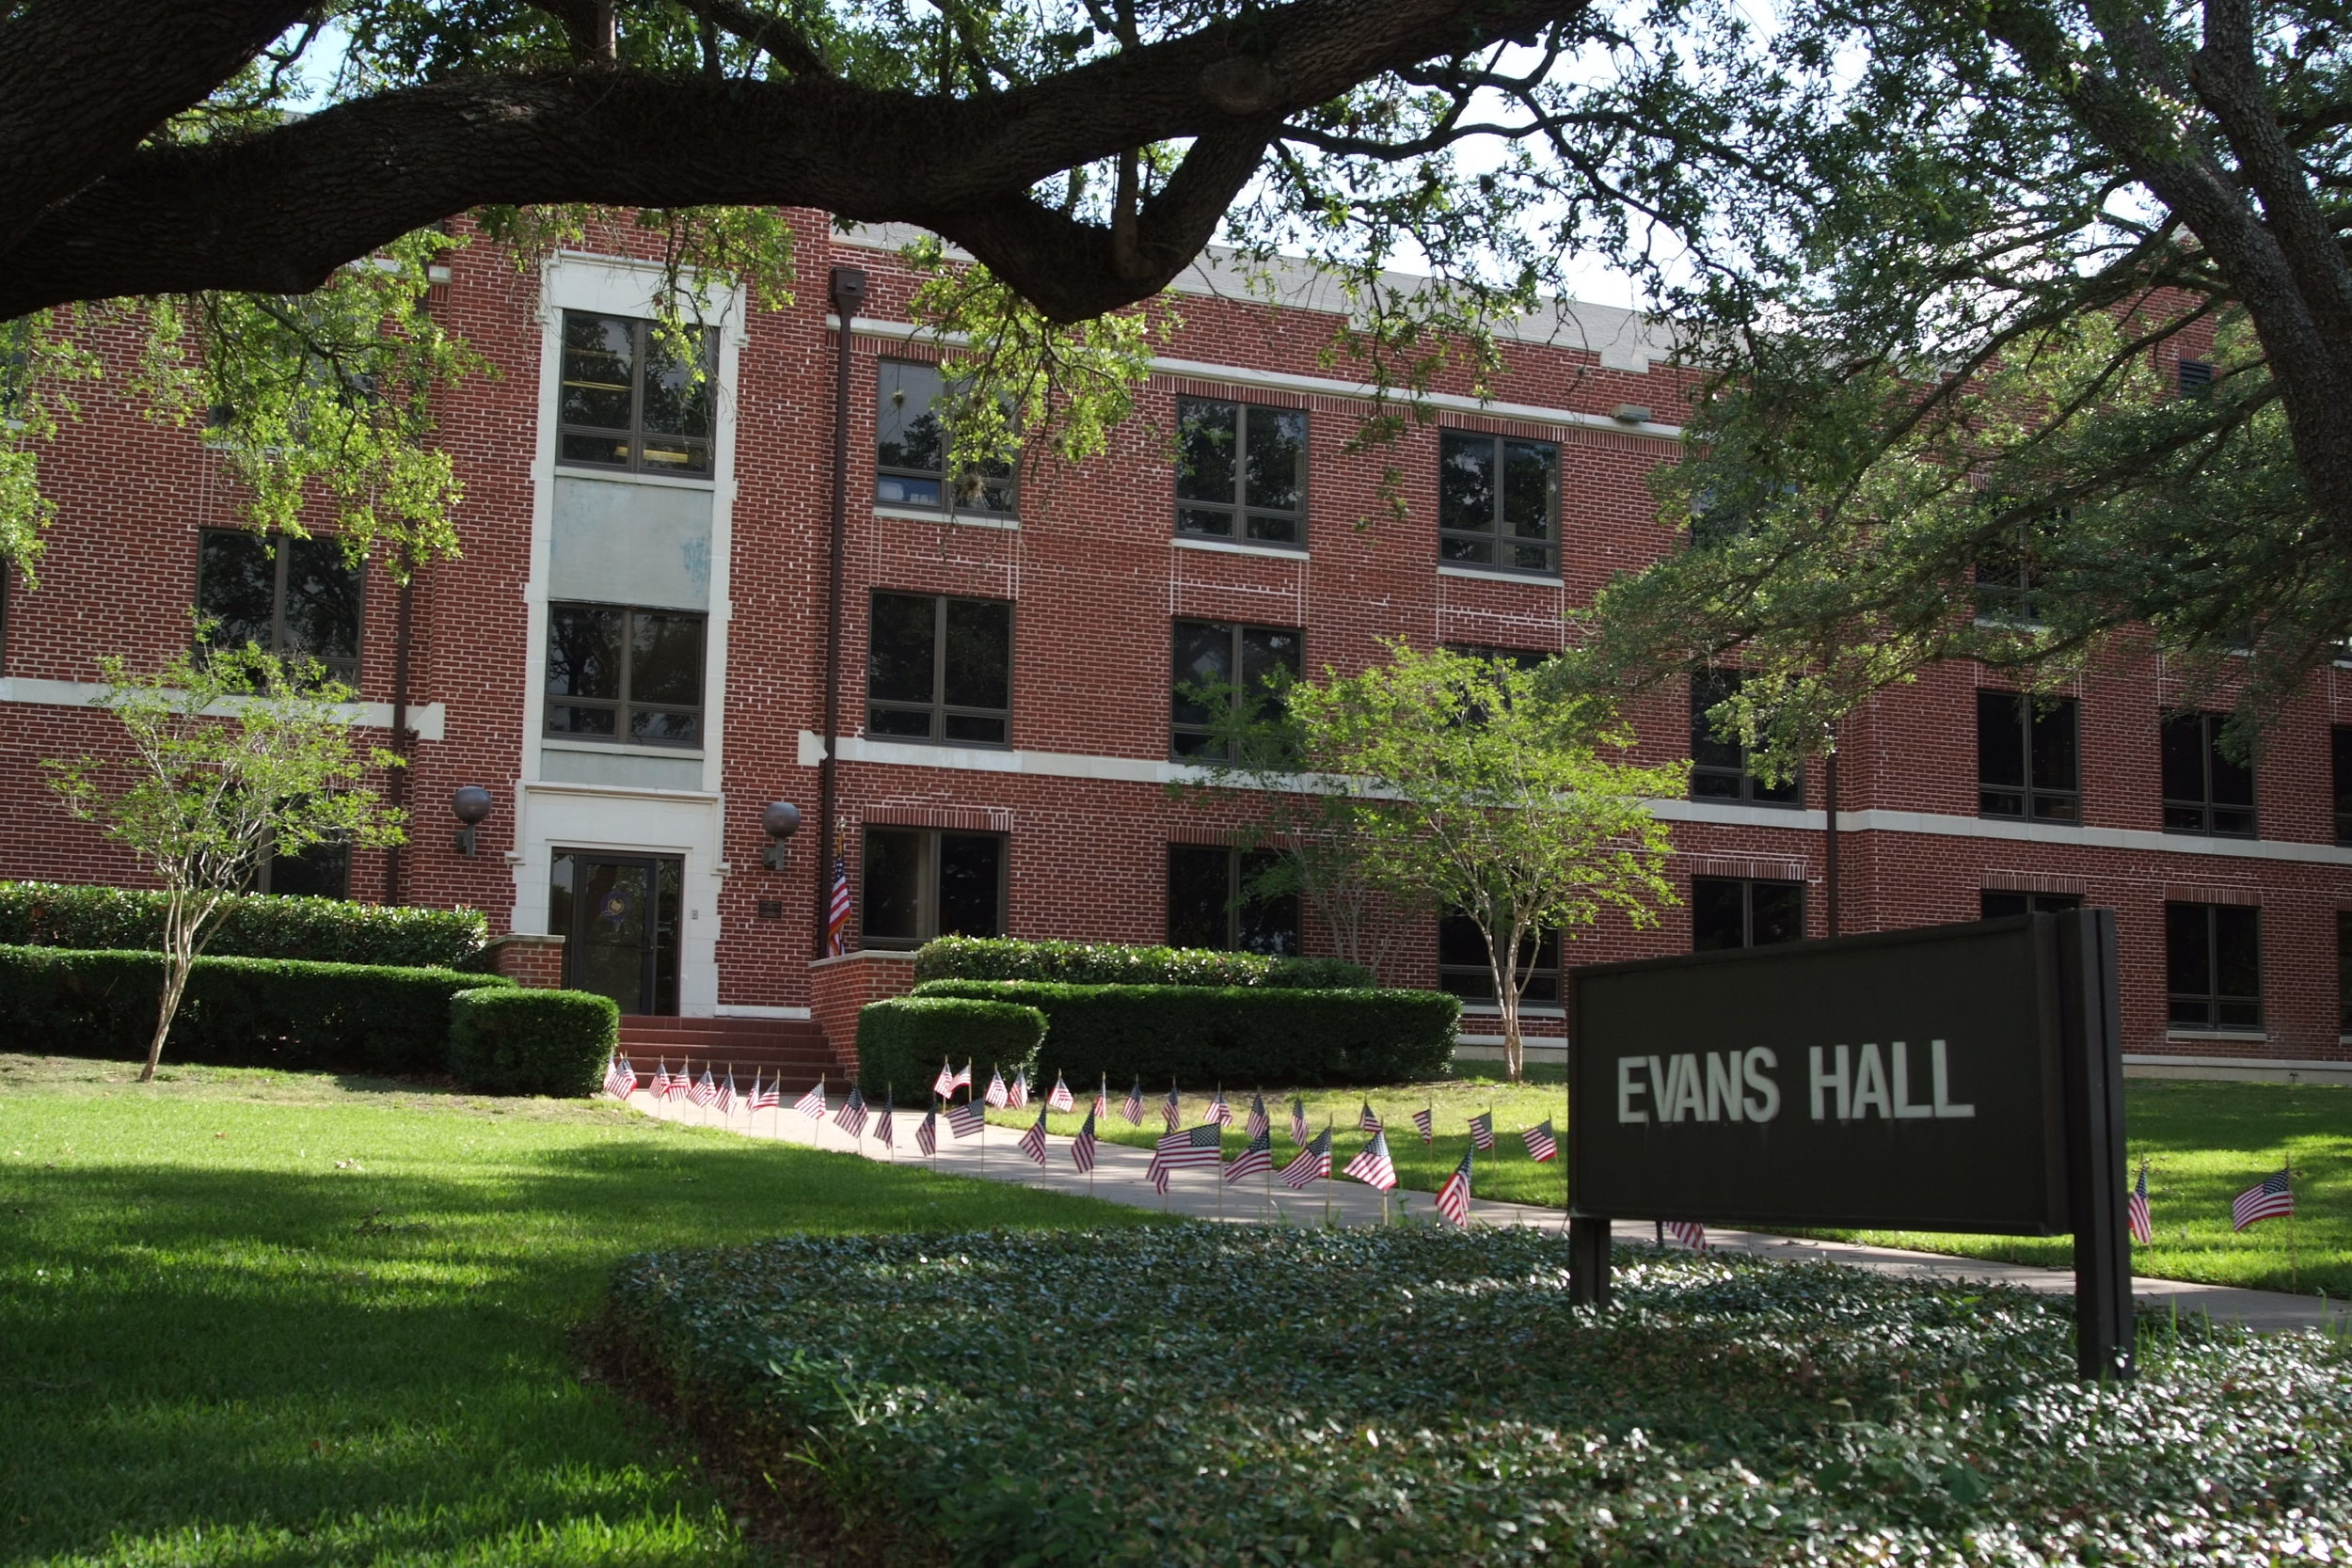 PVAMU Evans Hall.jpg